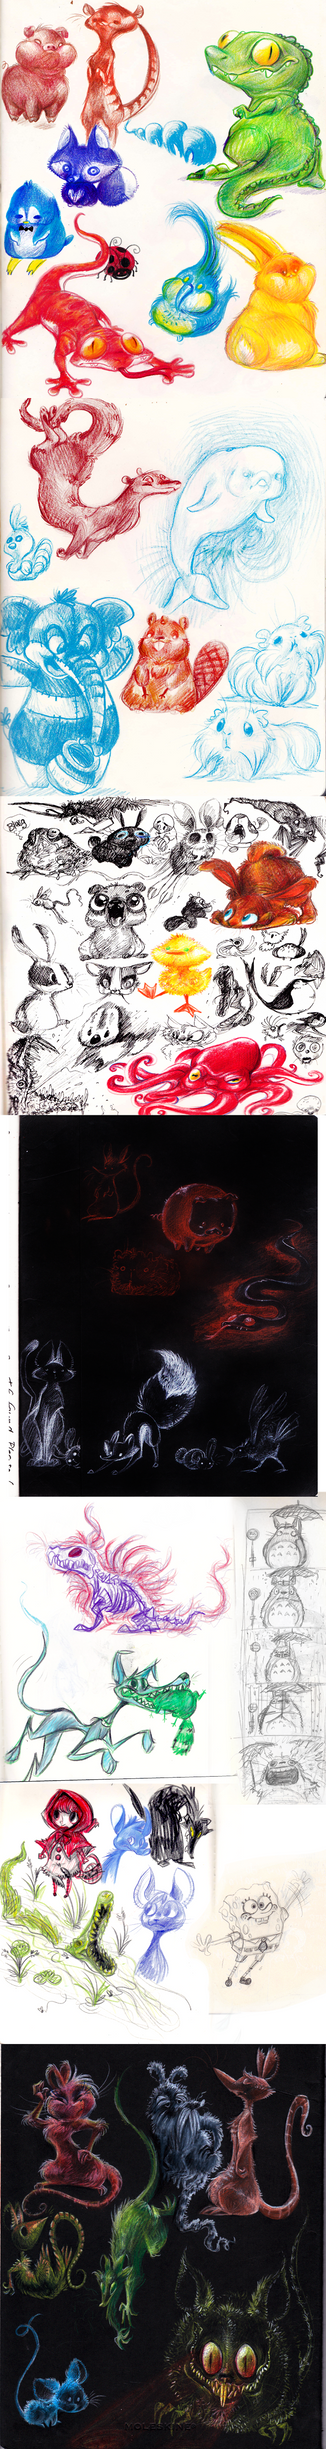 Notebook doodles by ArtistsBlood